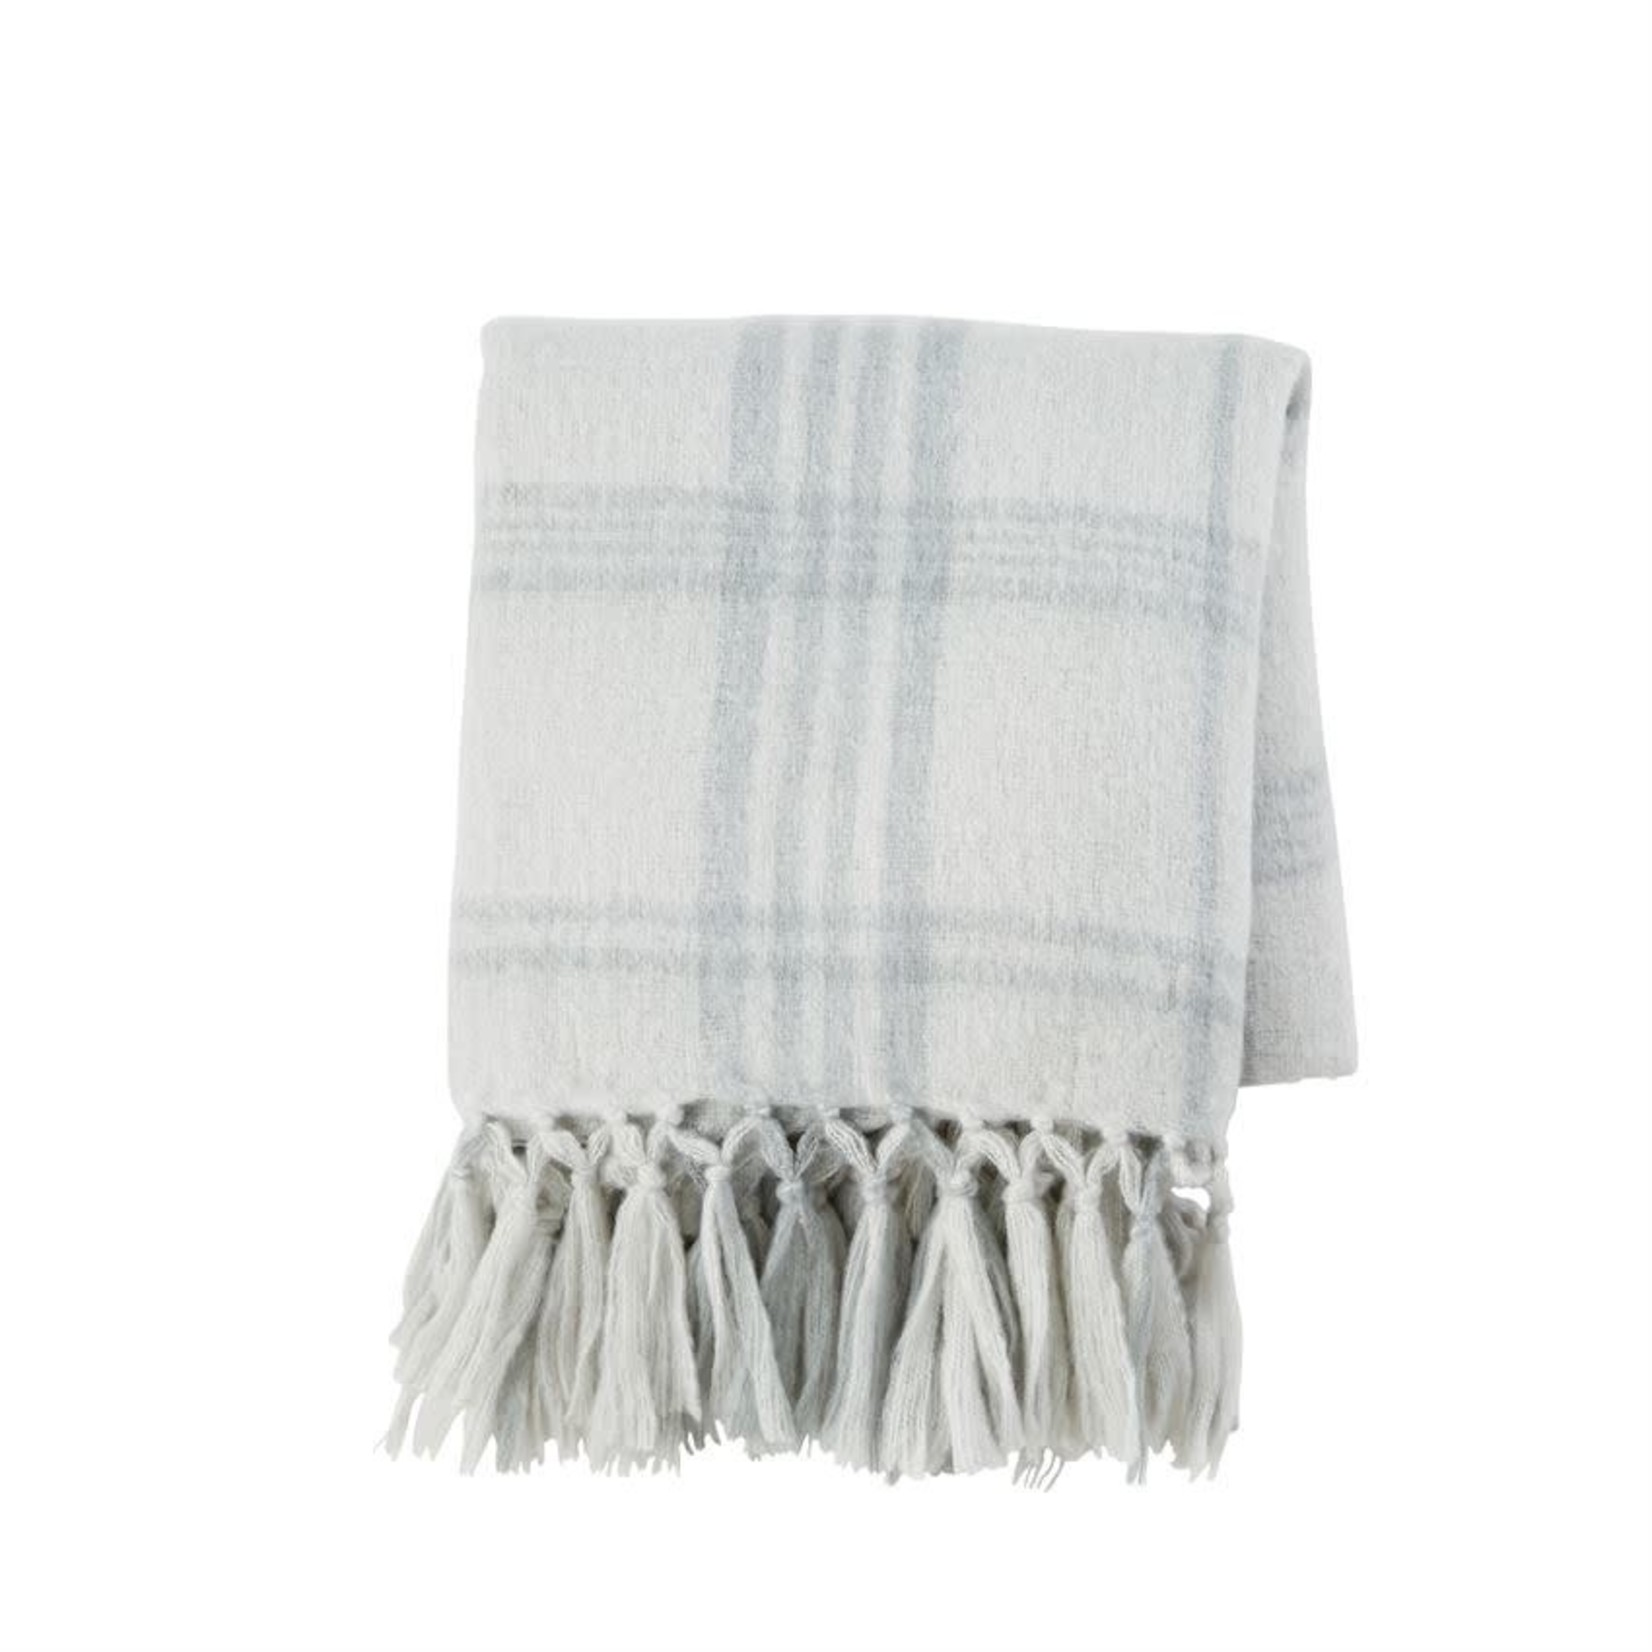 Brushed Wool Blend Throw